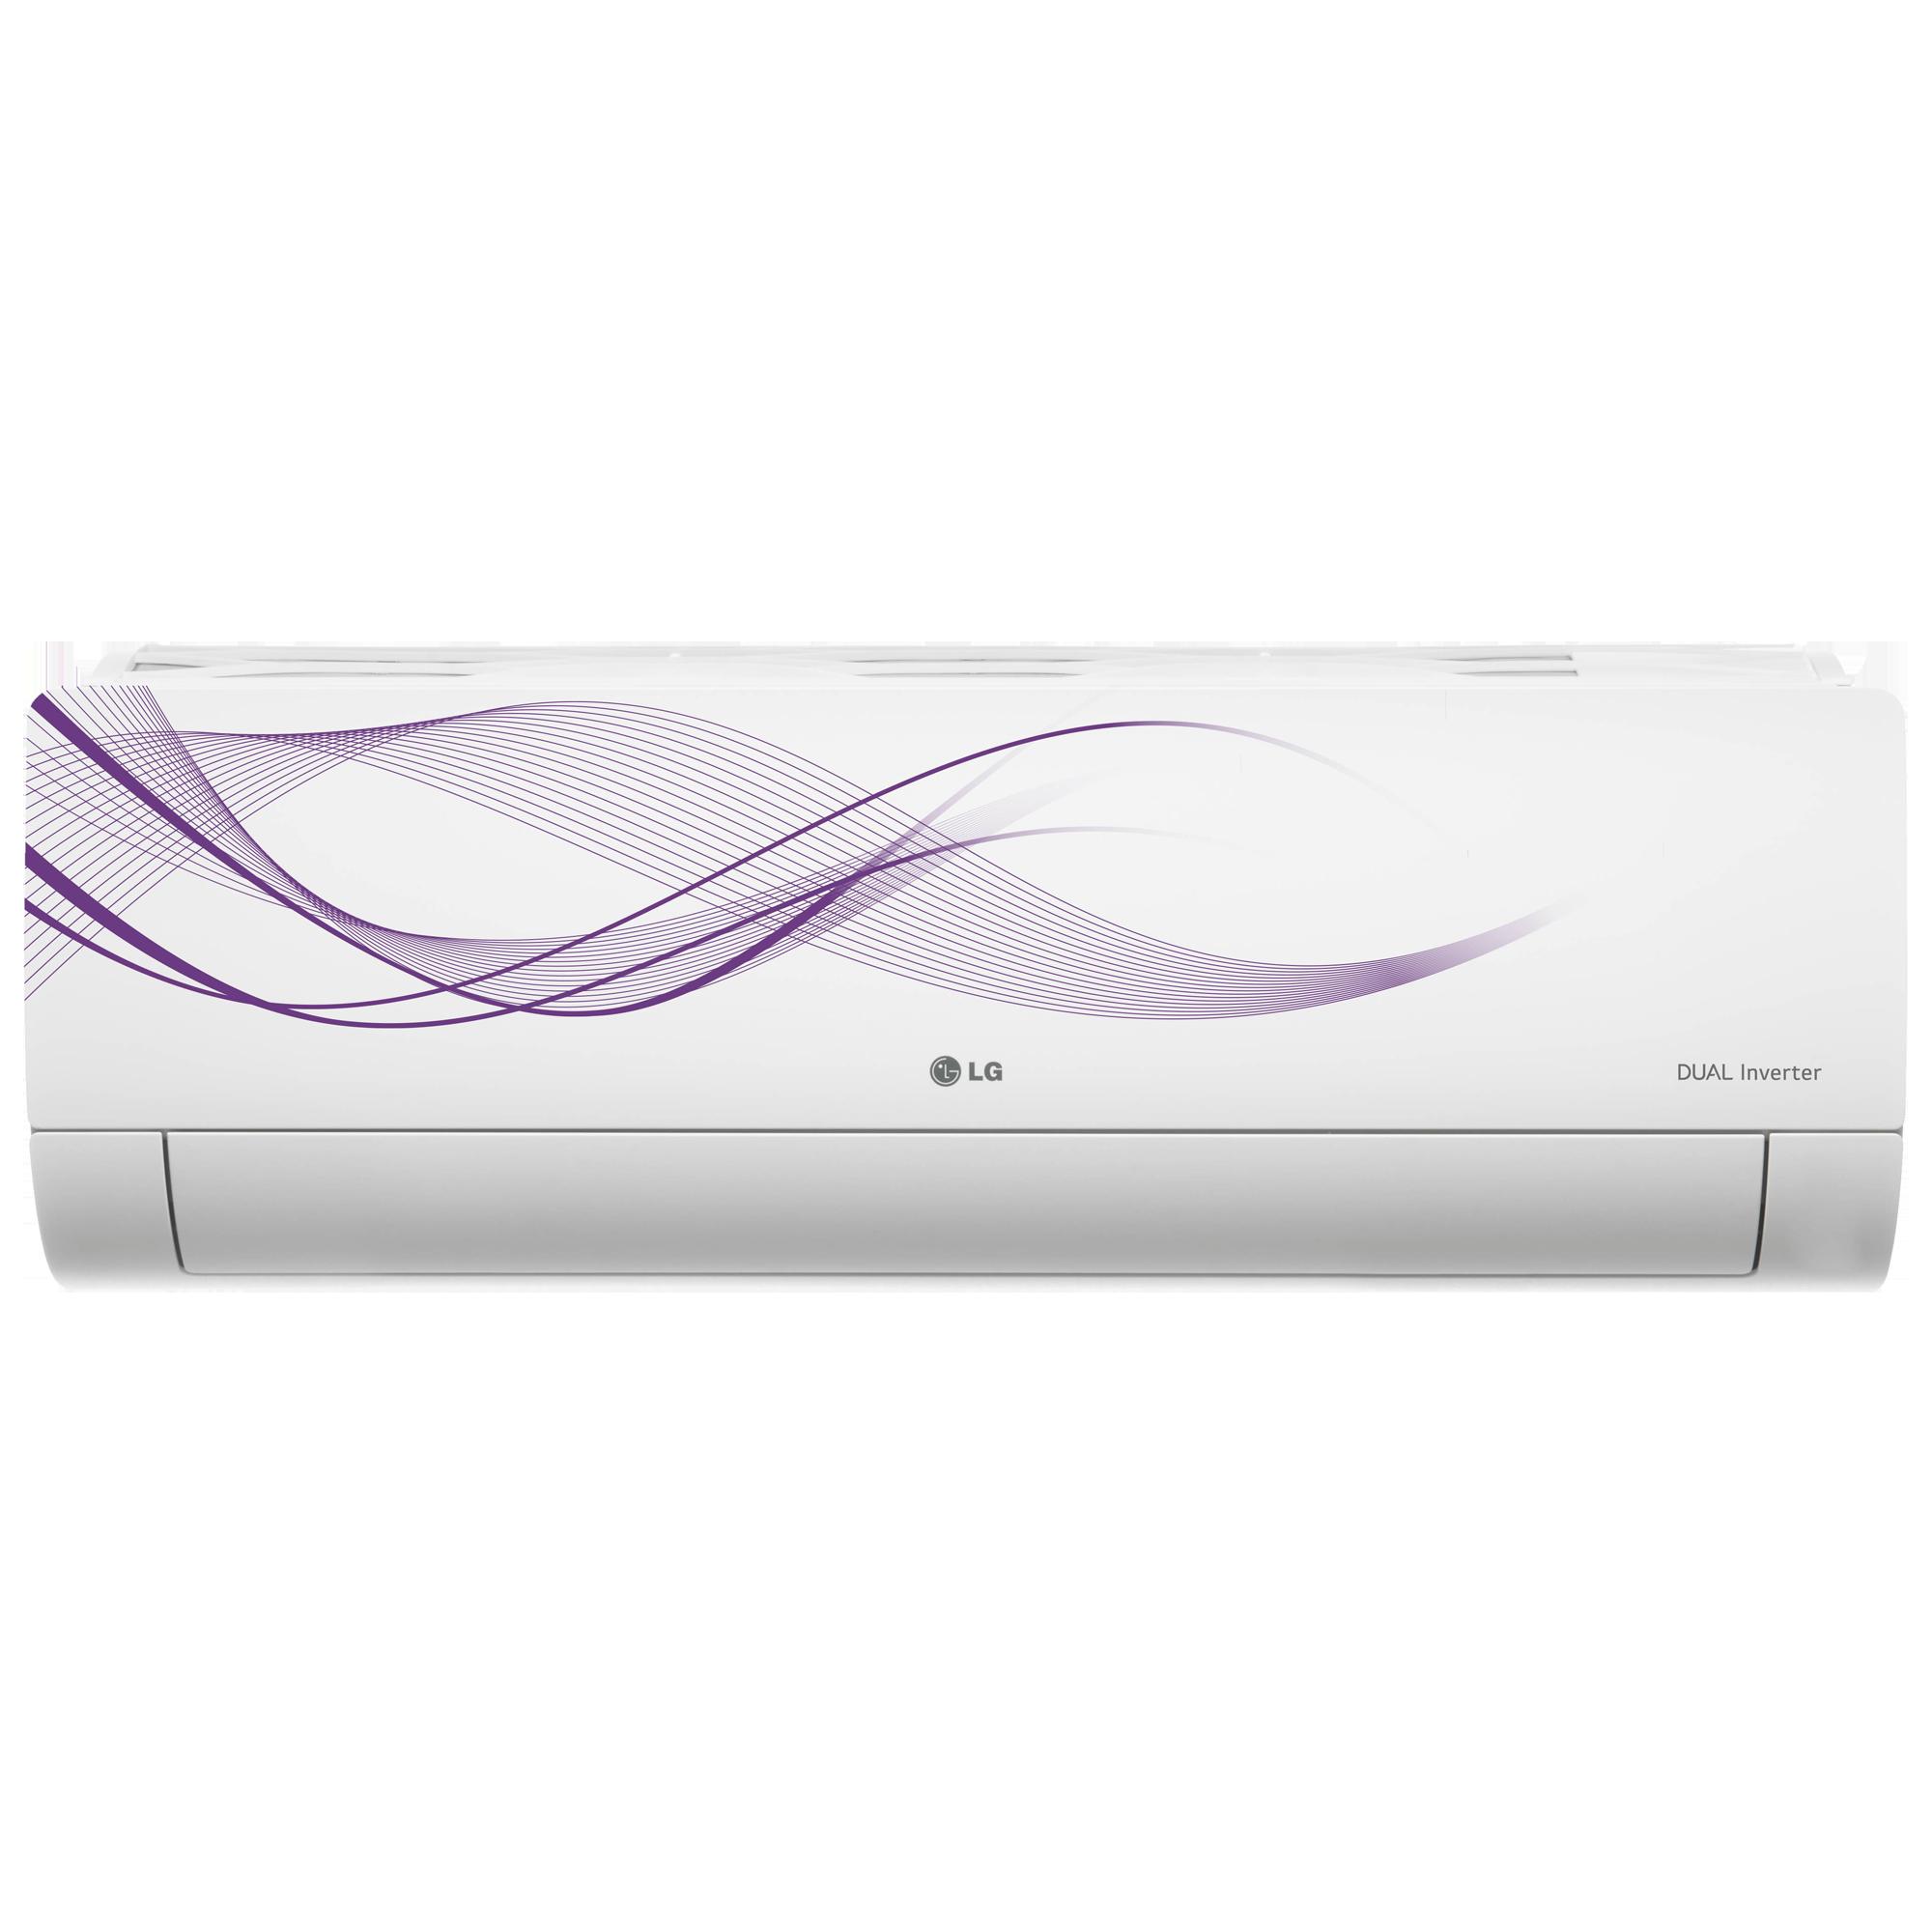 LG 1.5 Ton 5 Star Inverter Split AC (Air Purification Filter, Copper Condenser, MS-Q18WNZA, White)